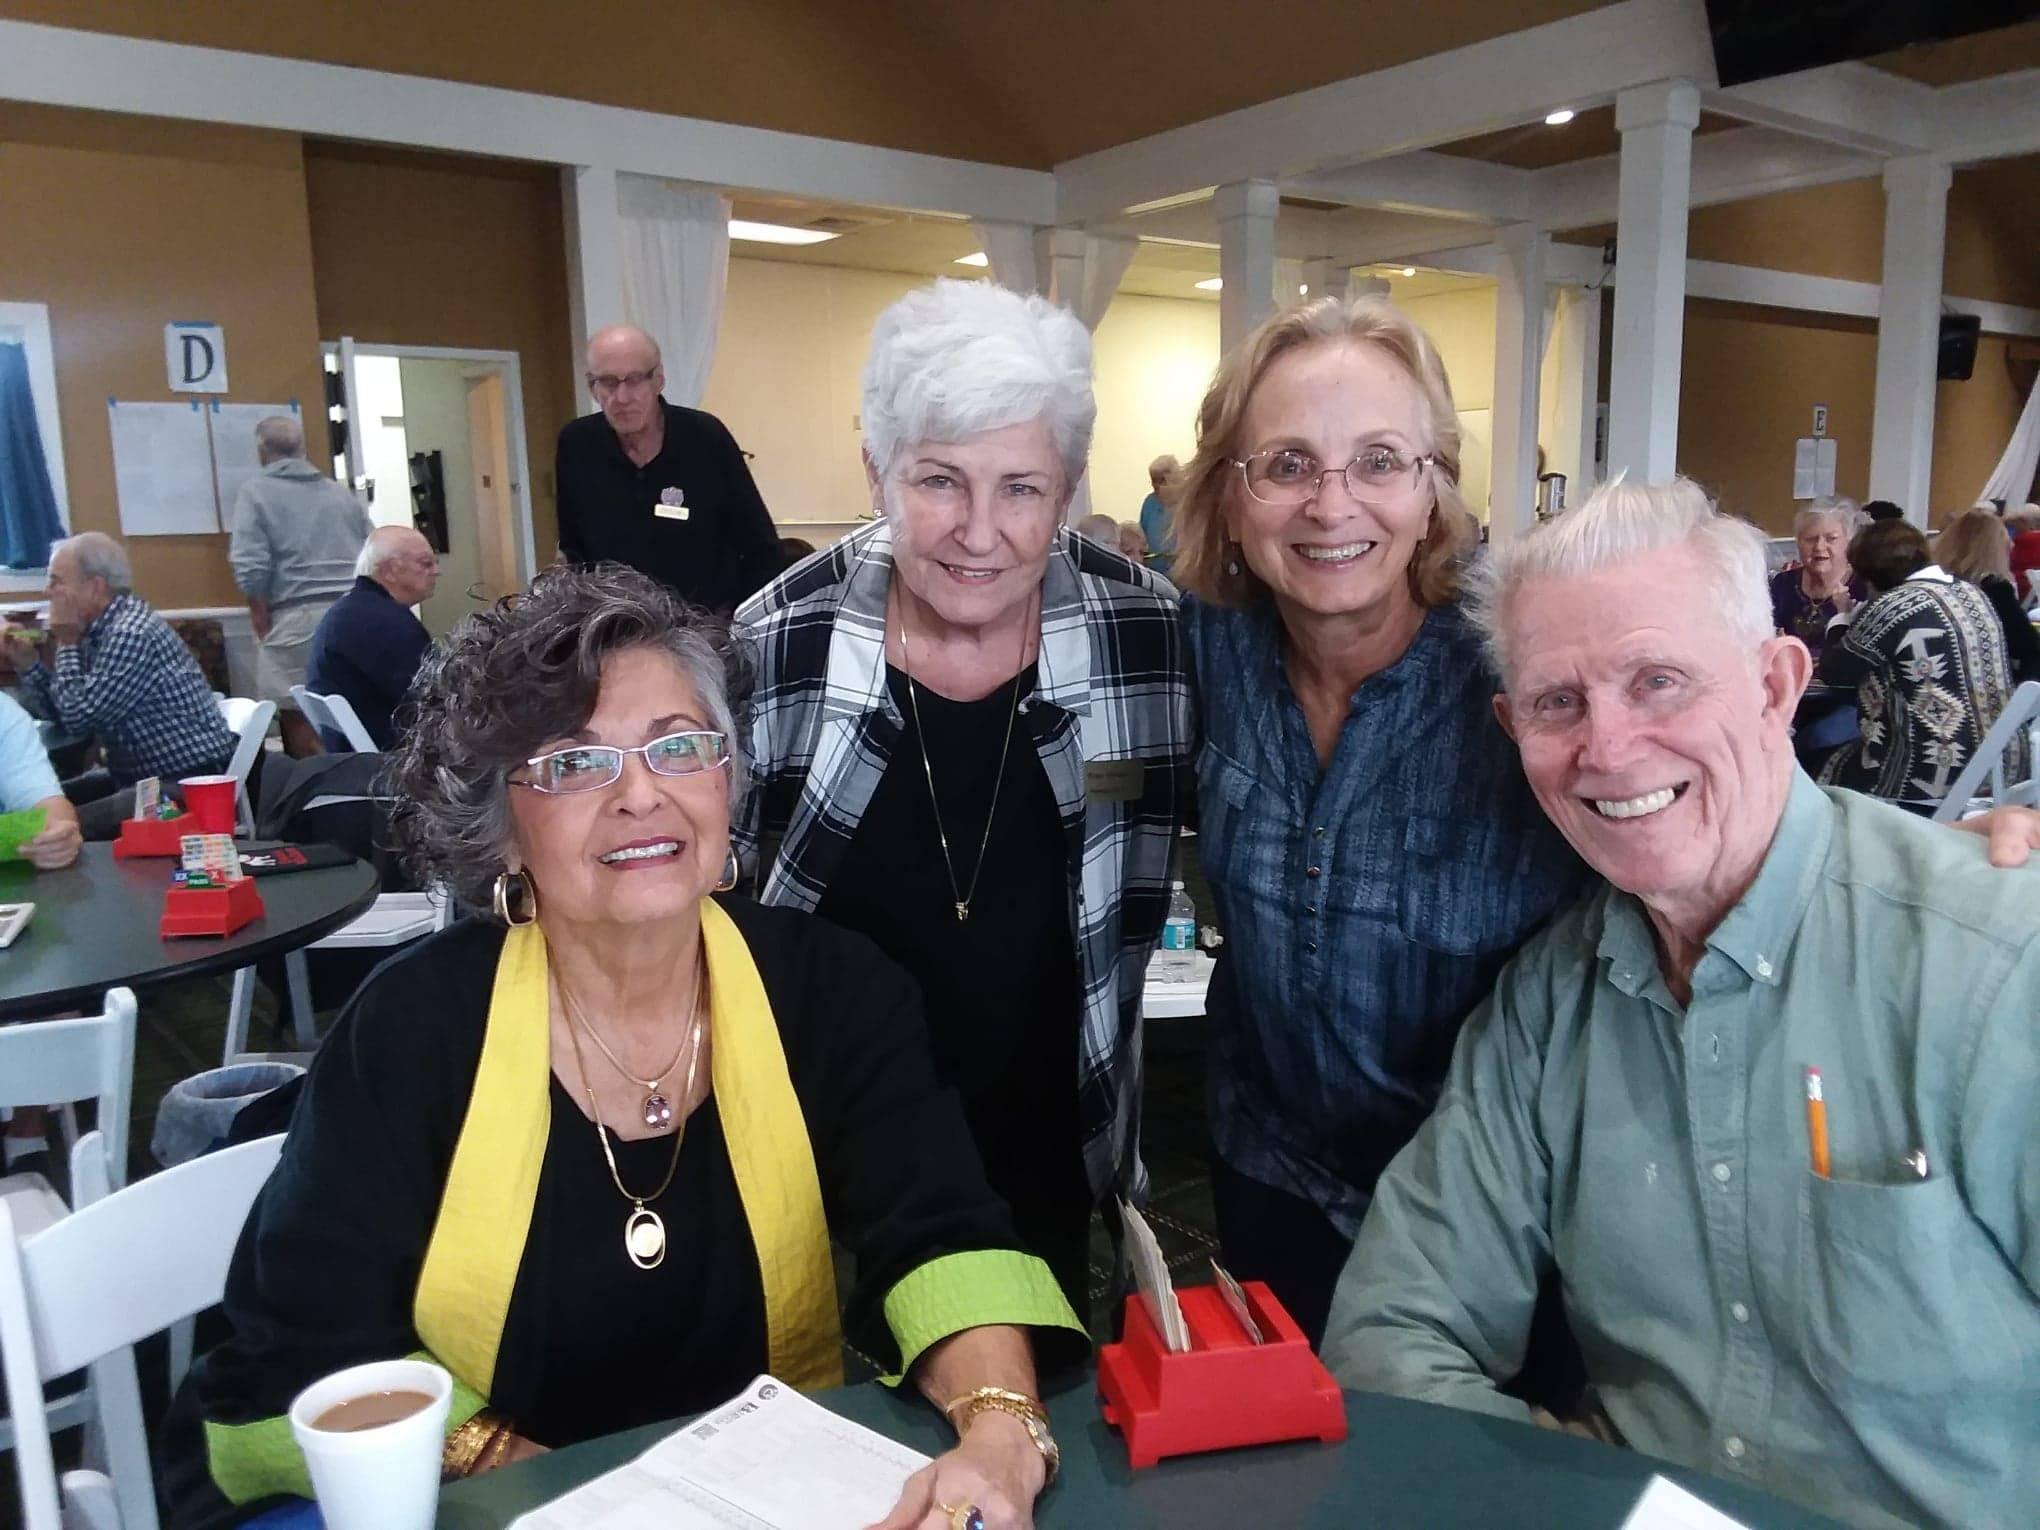 Joyce Gardner, Fran Viviano, Mary Cummins, our outstanding partnership chair & Billy Sanders